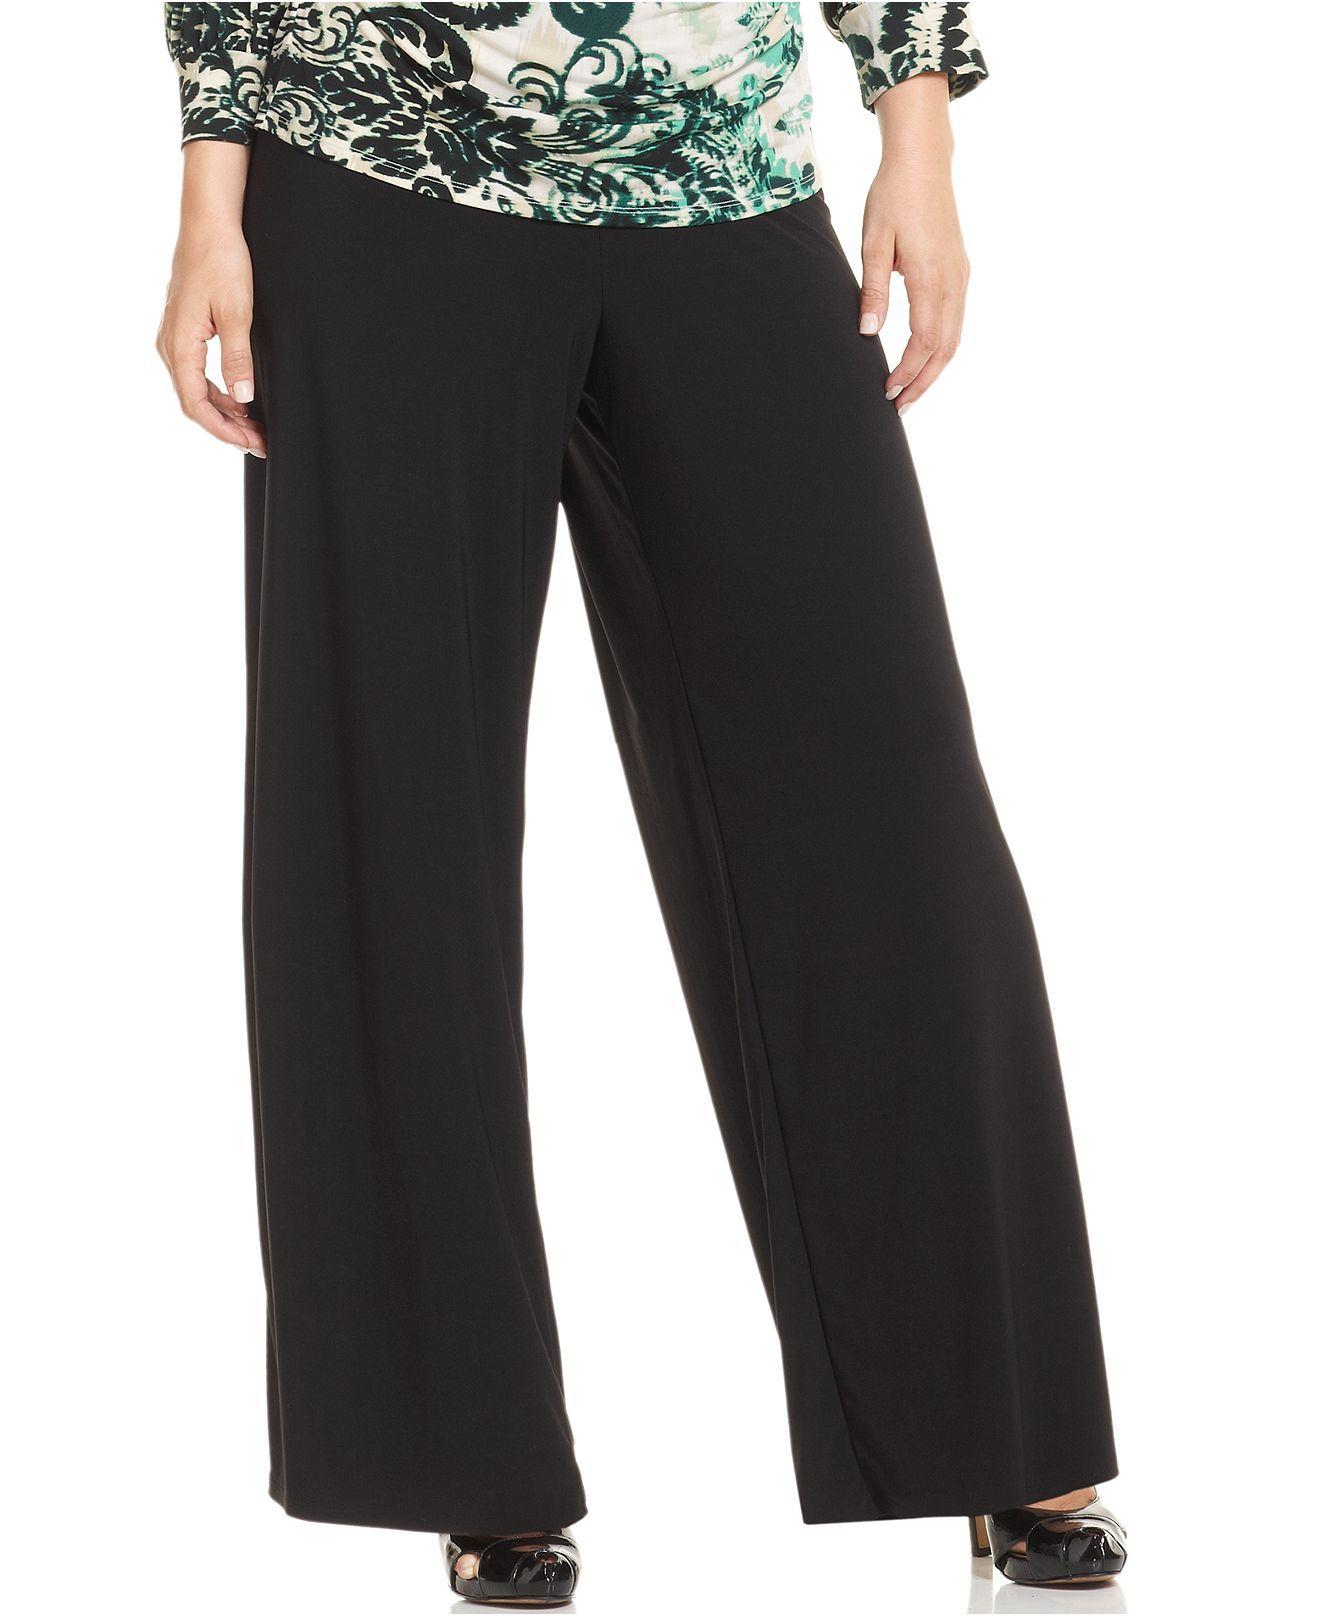 7d48f828926 Alfani Plus Size Pants